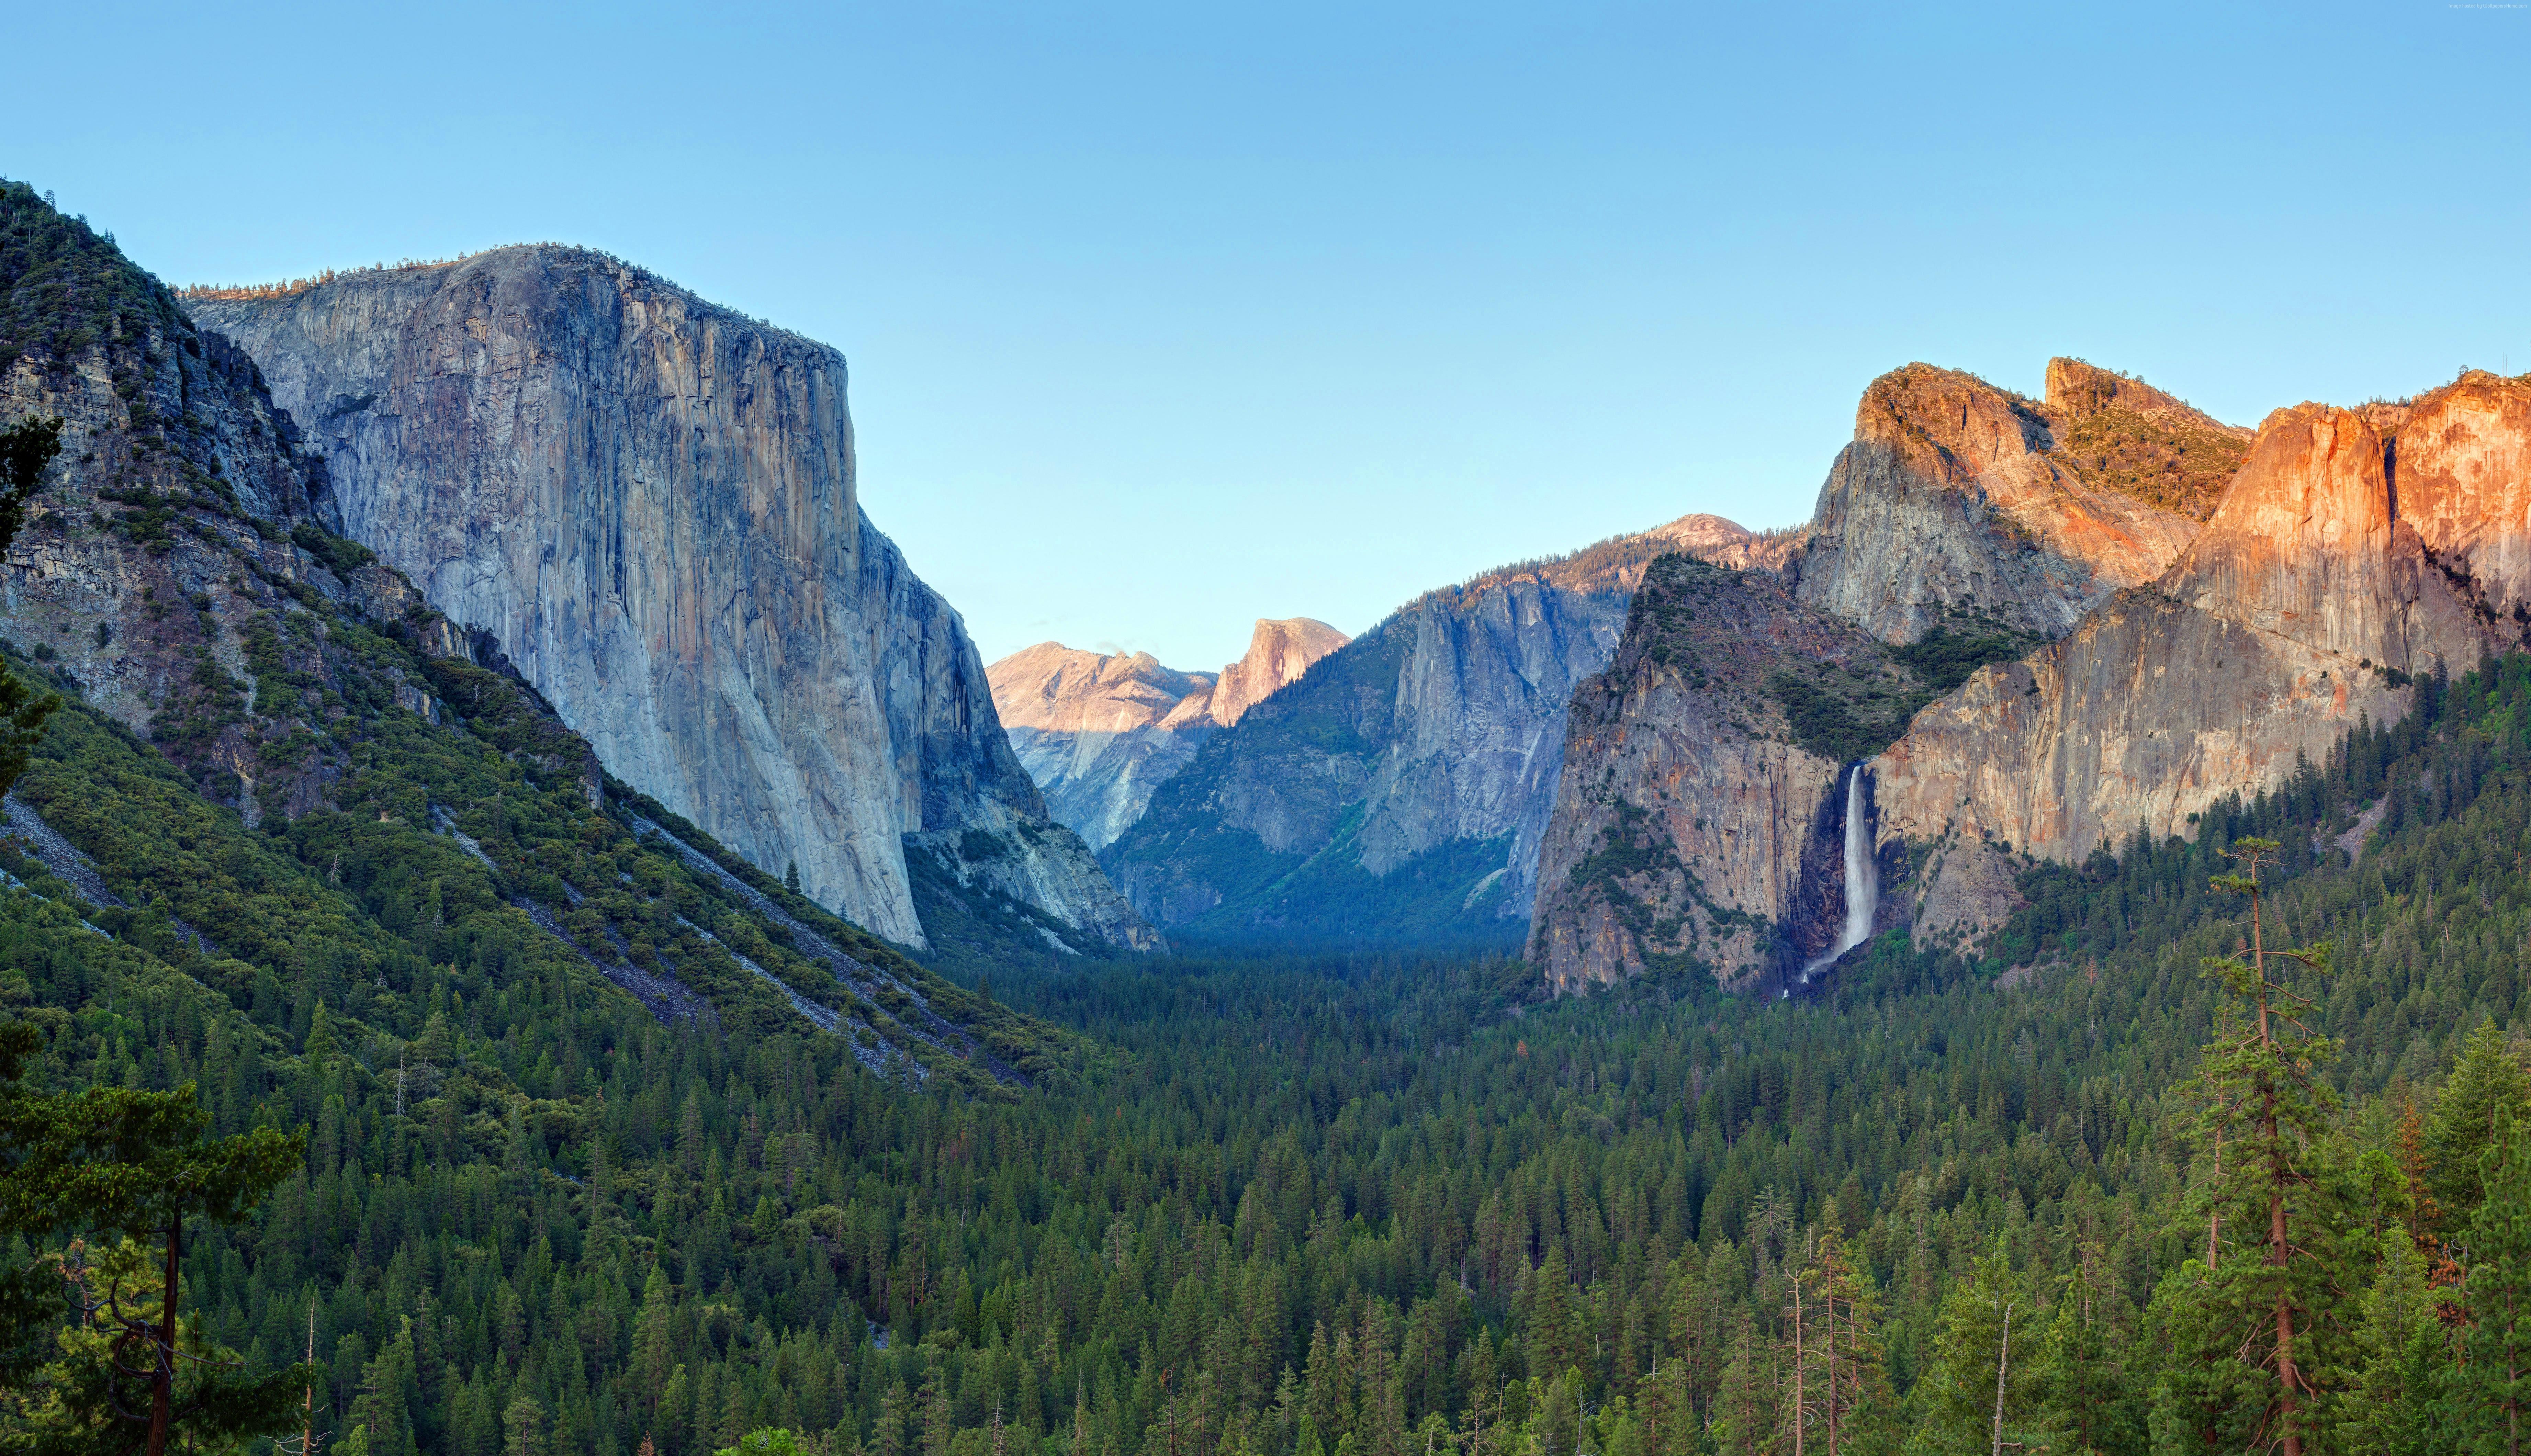 Yosemite Wallpaper Nature Forest Yosemite 5k Wallpapers 7368x4239